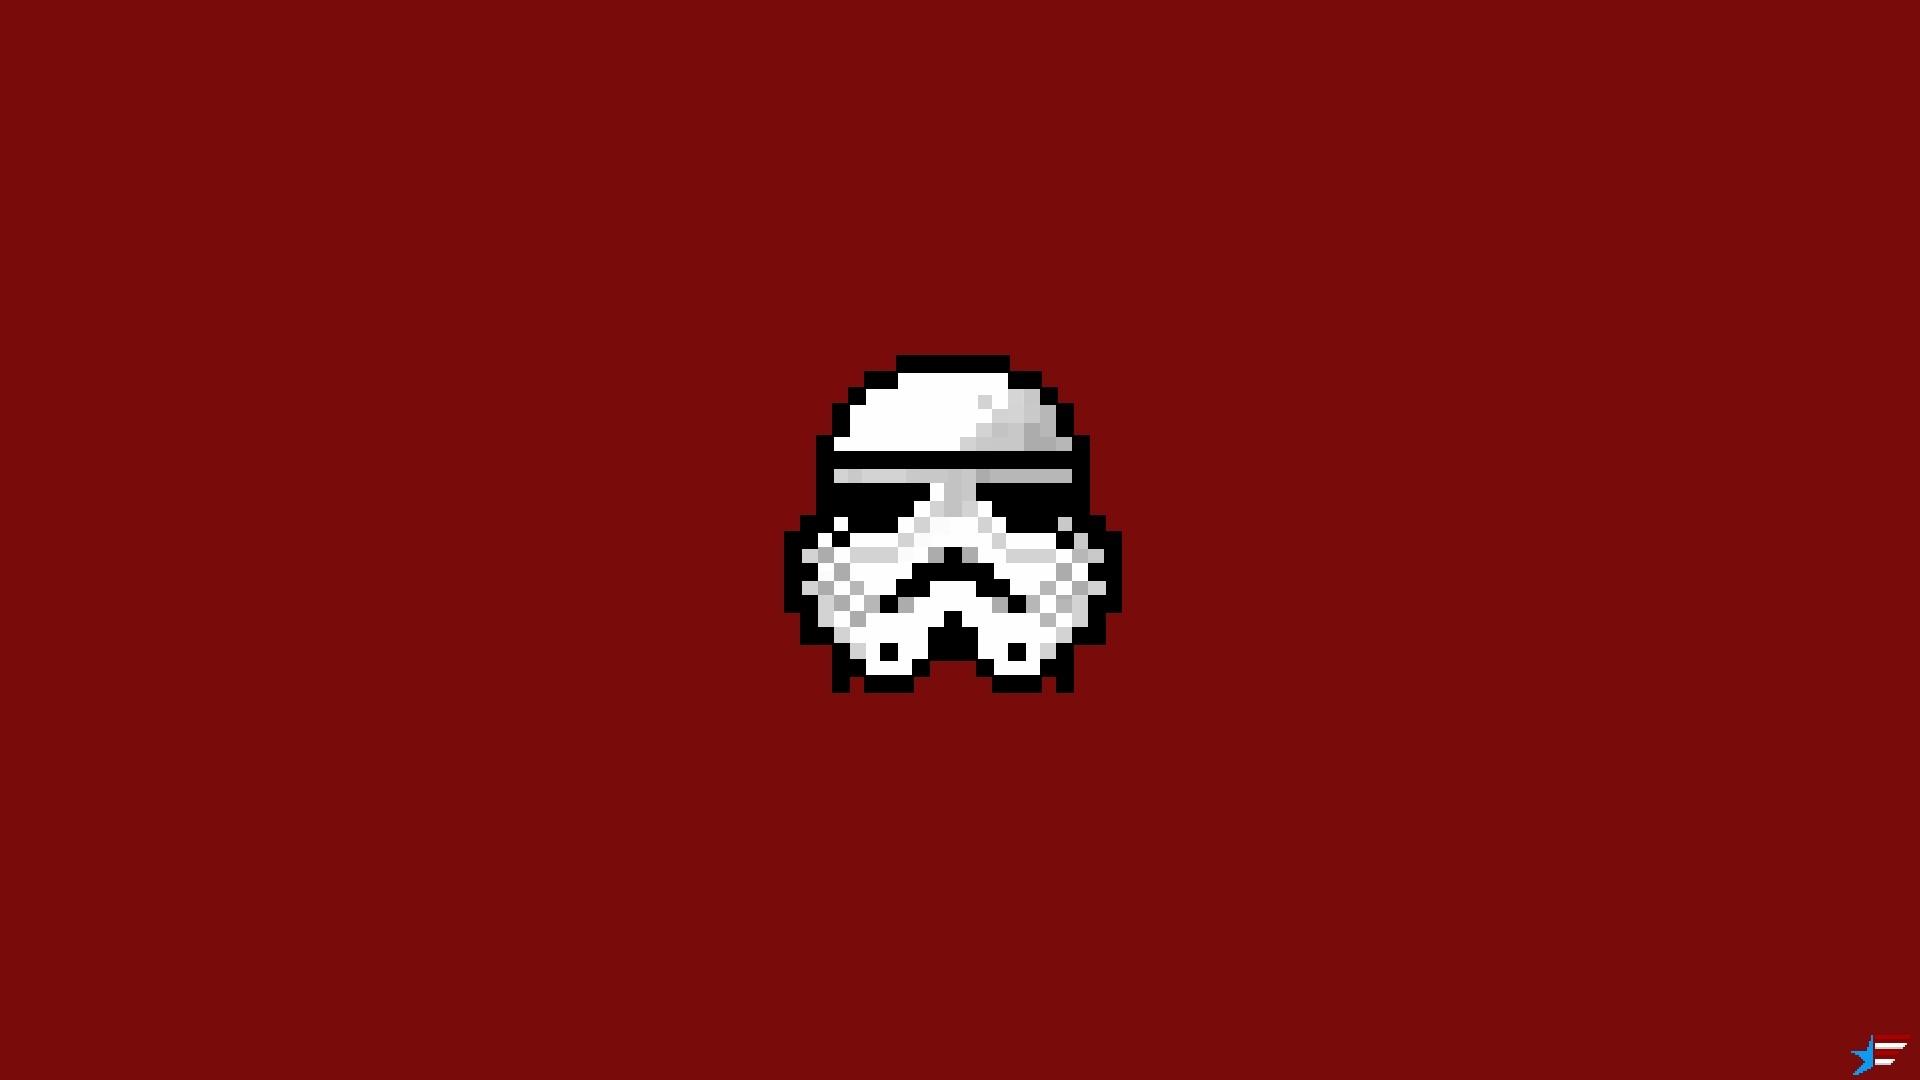 Wallpaper 8 bit 8bit pixelart pixel art stormtrooper storm 1920x1080